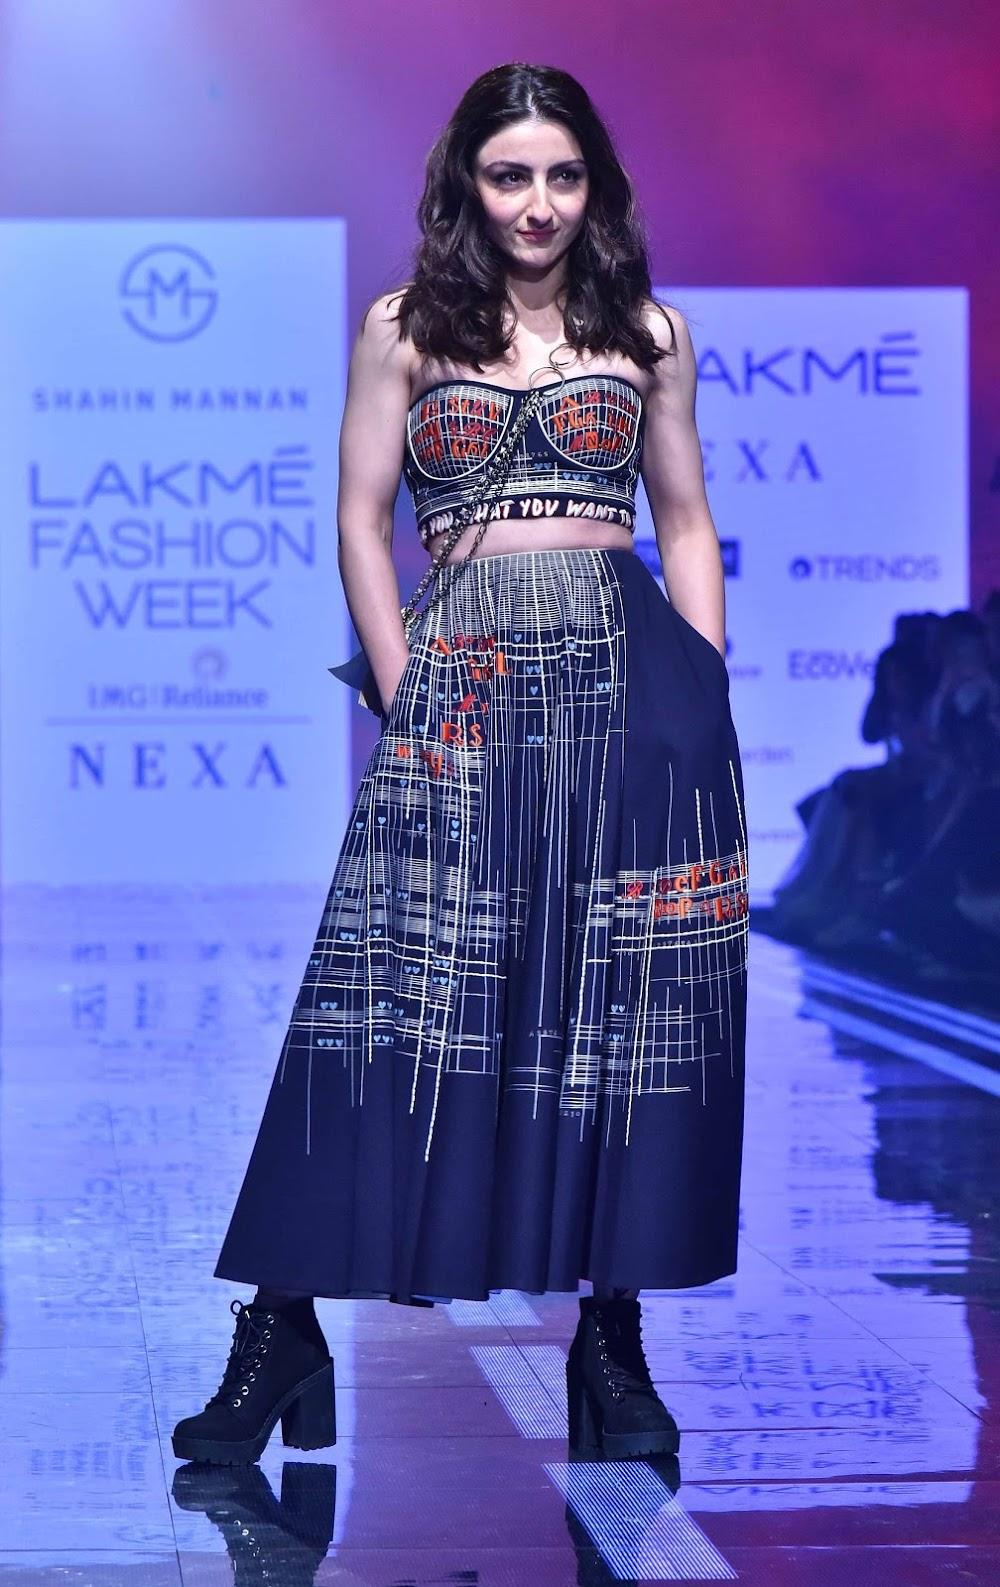 lakme-fashion-week-summer-2020-best-dressed_soha_ali_khan